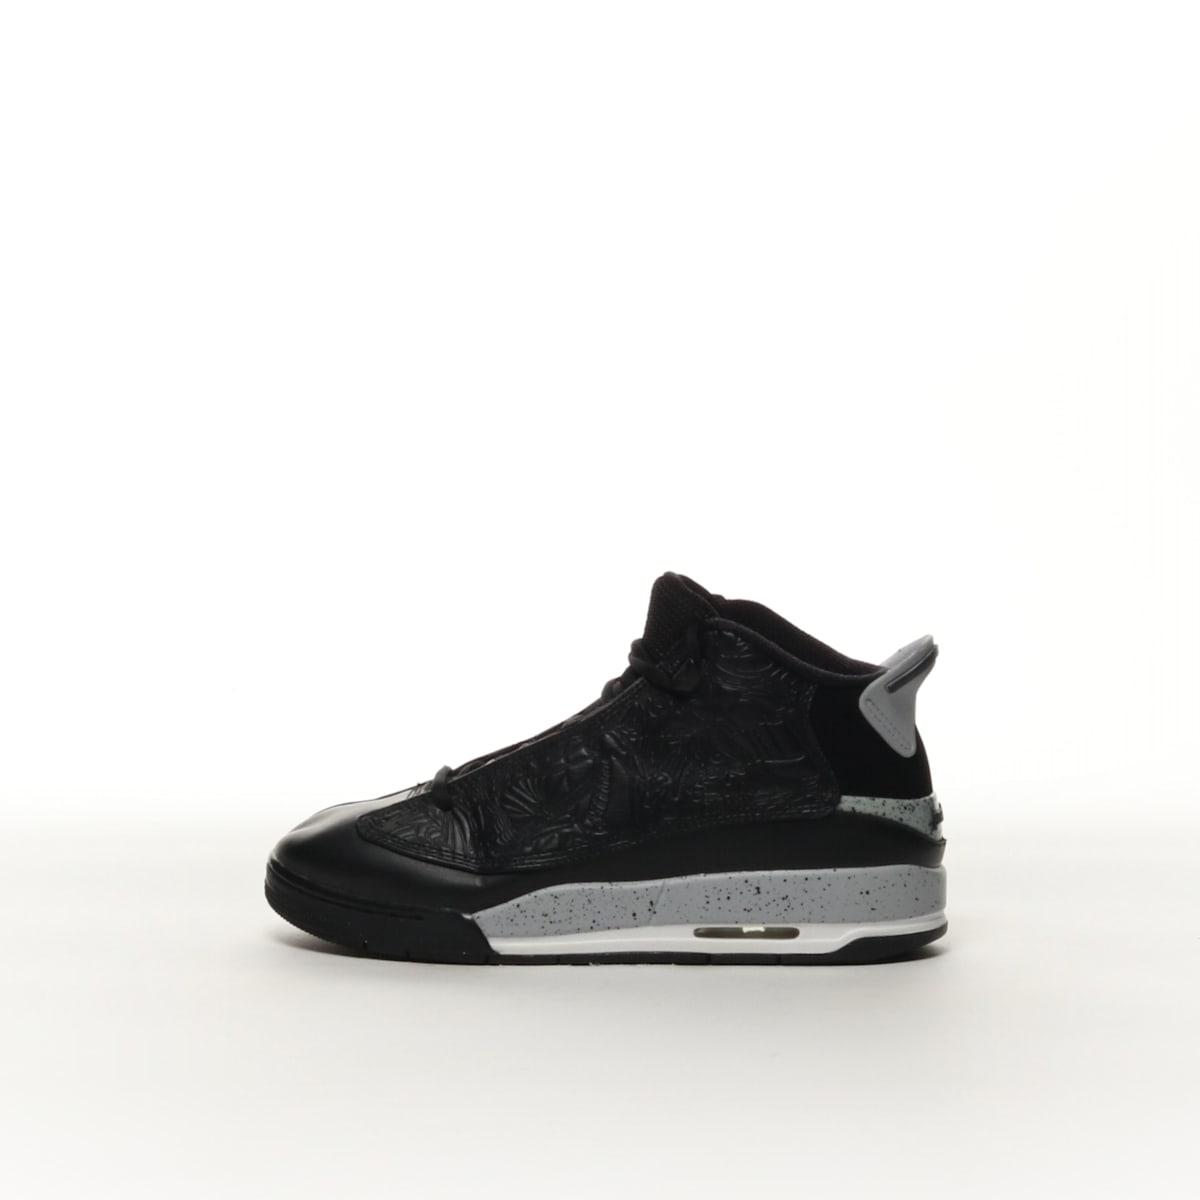 a60a828ab6 Boys' Air Jordan Dub Zero (GS) Shoe - BLACK/WOLF GREY-WHITE – Resku